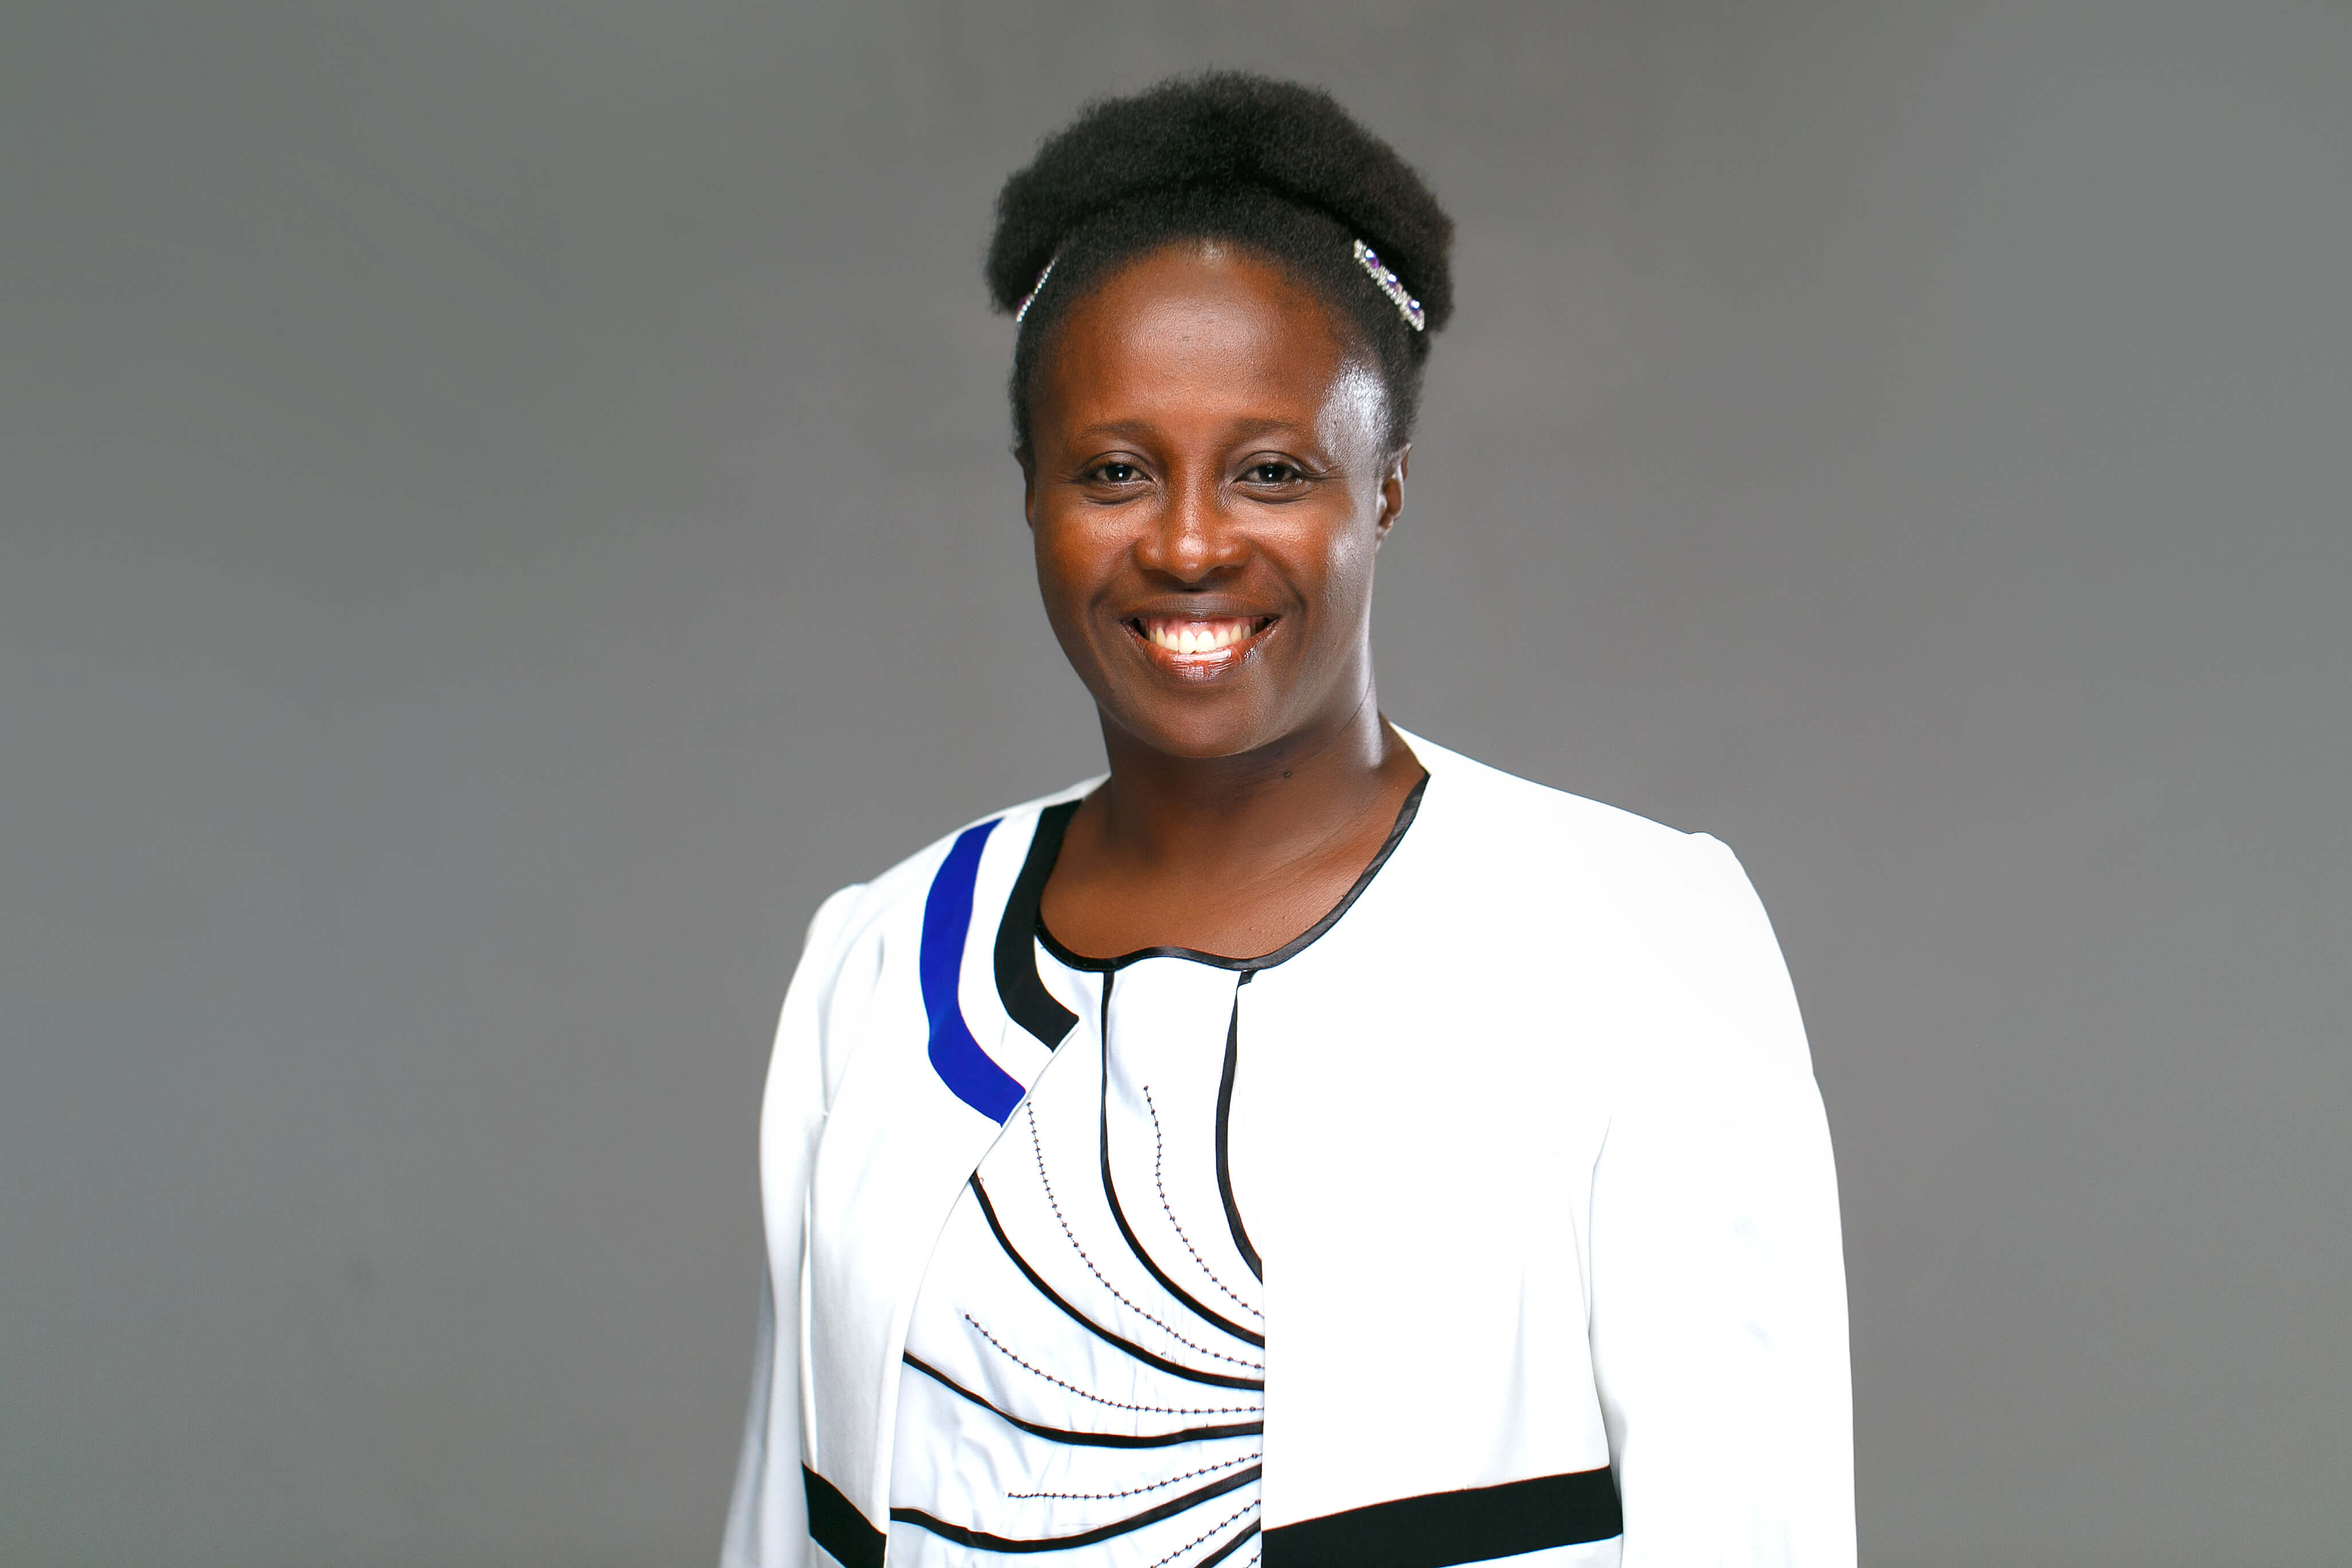 Obayemi Funmilayo, CEO, Davrem Educational Services